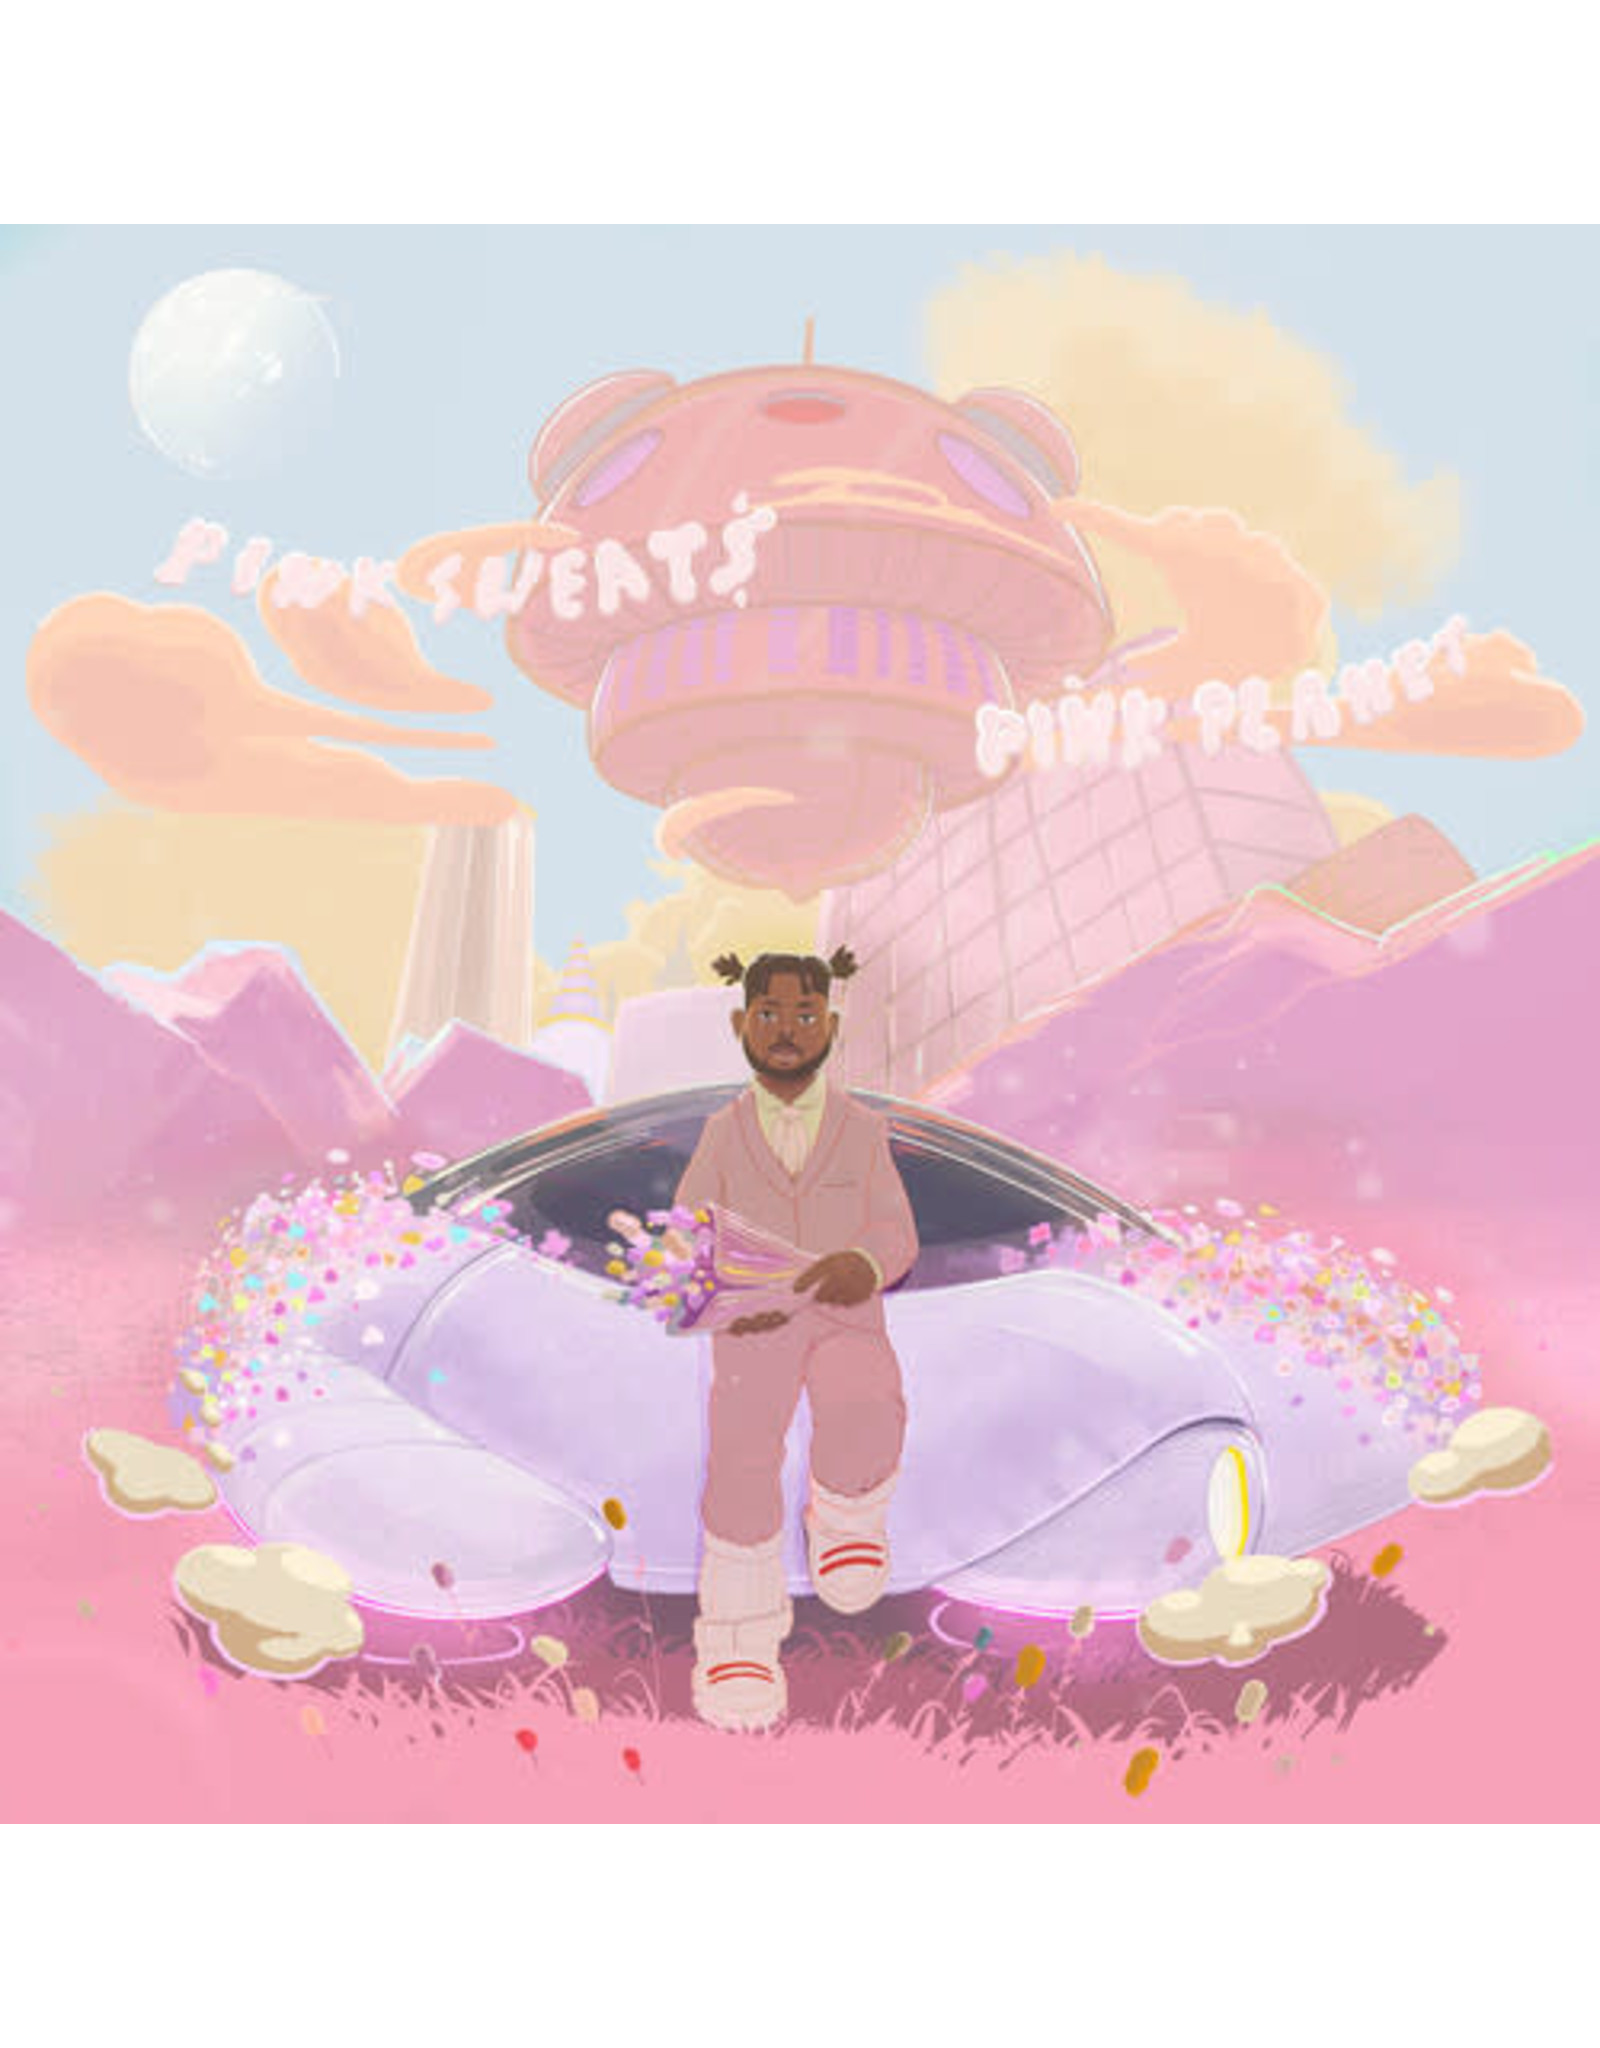 New Vinyl Pink Sweat$ - Pink Planet LP